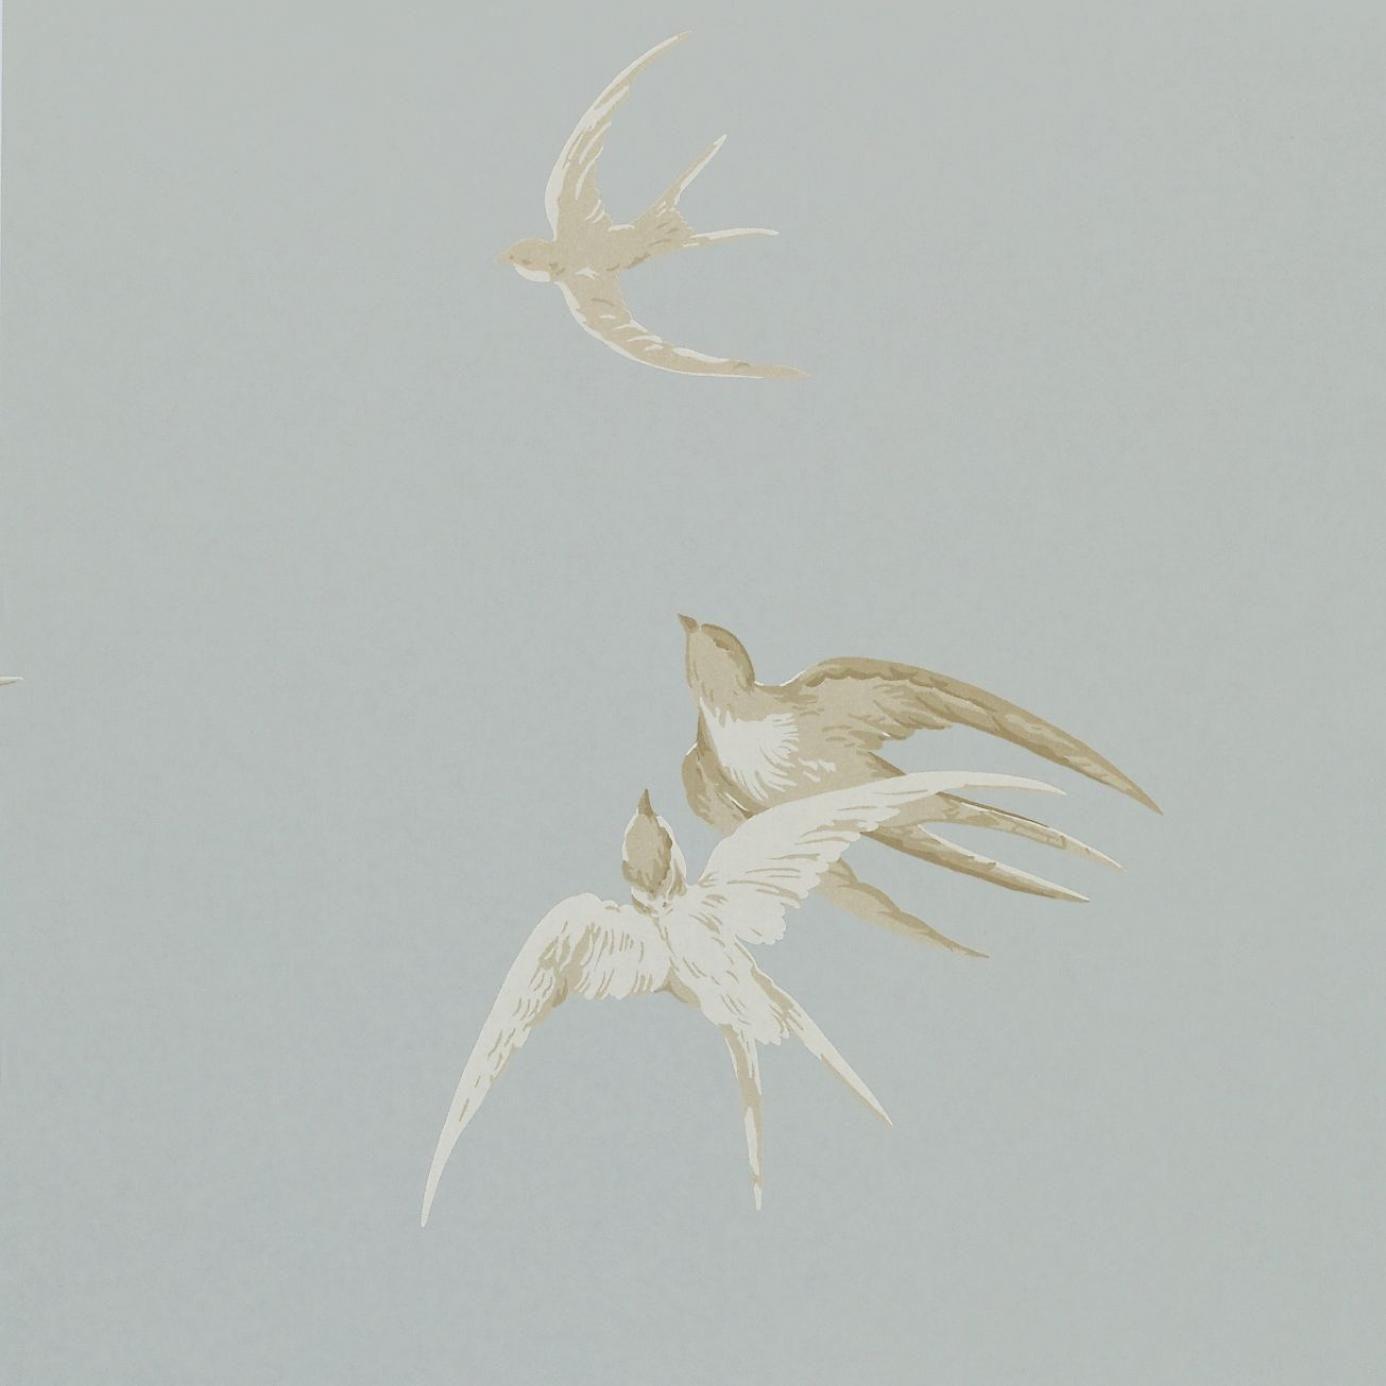 Swallows Wallpaper - Silver (DVIWSW104) - Sanderson Vintage Wallpapers Collection